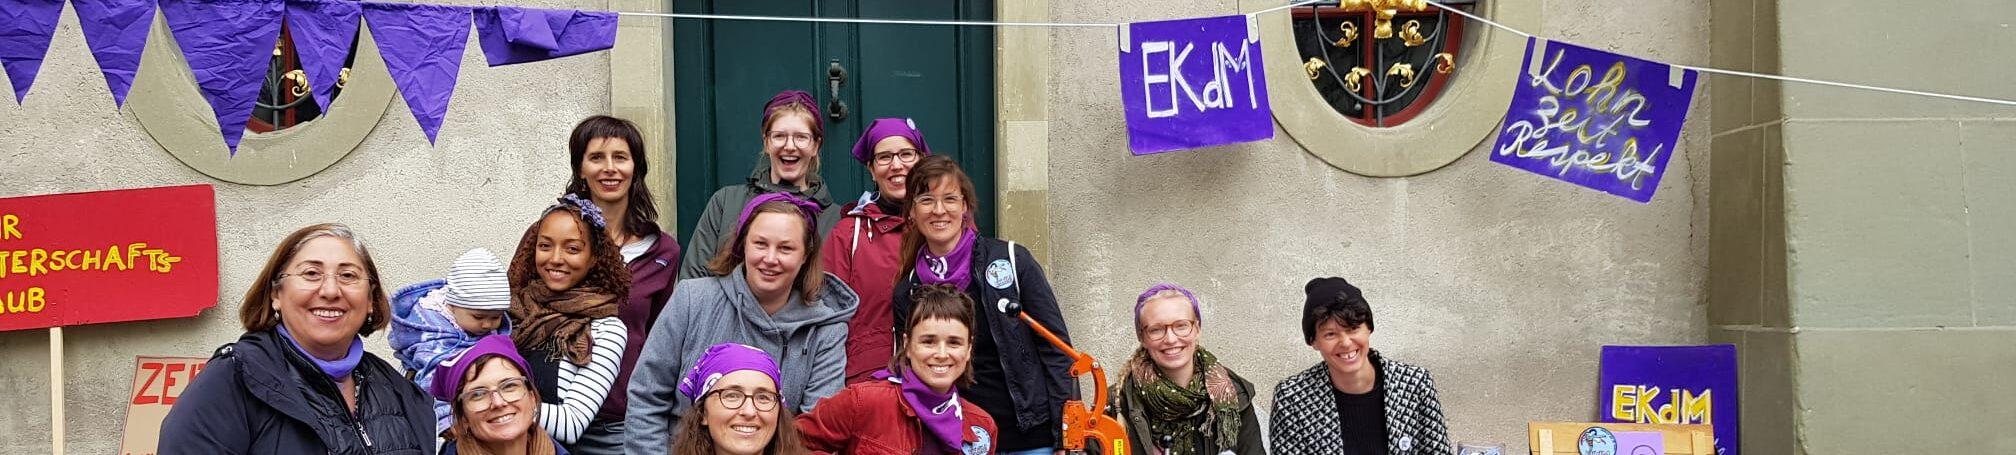 EKdM – Eidgenössische Kommission dini Mueter